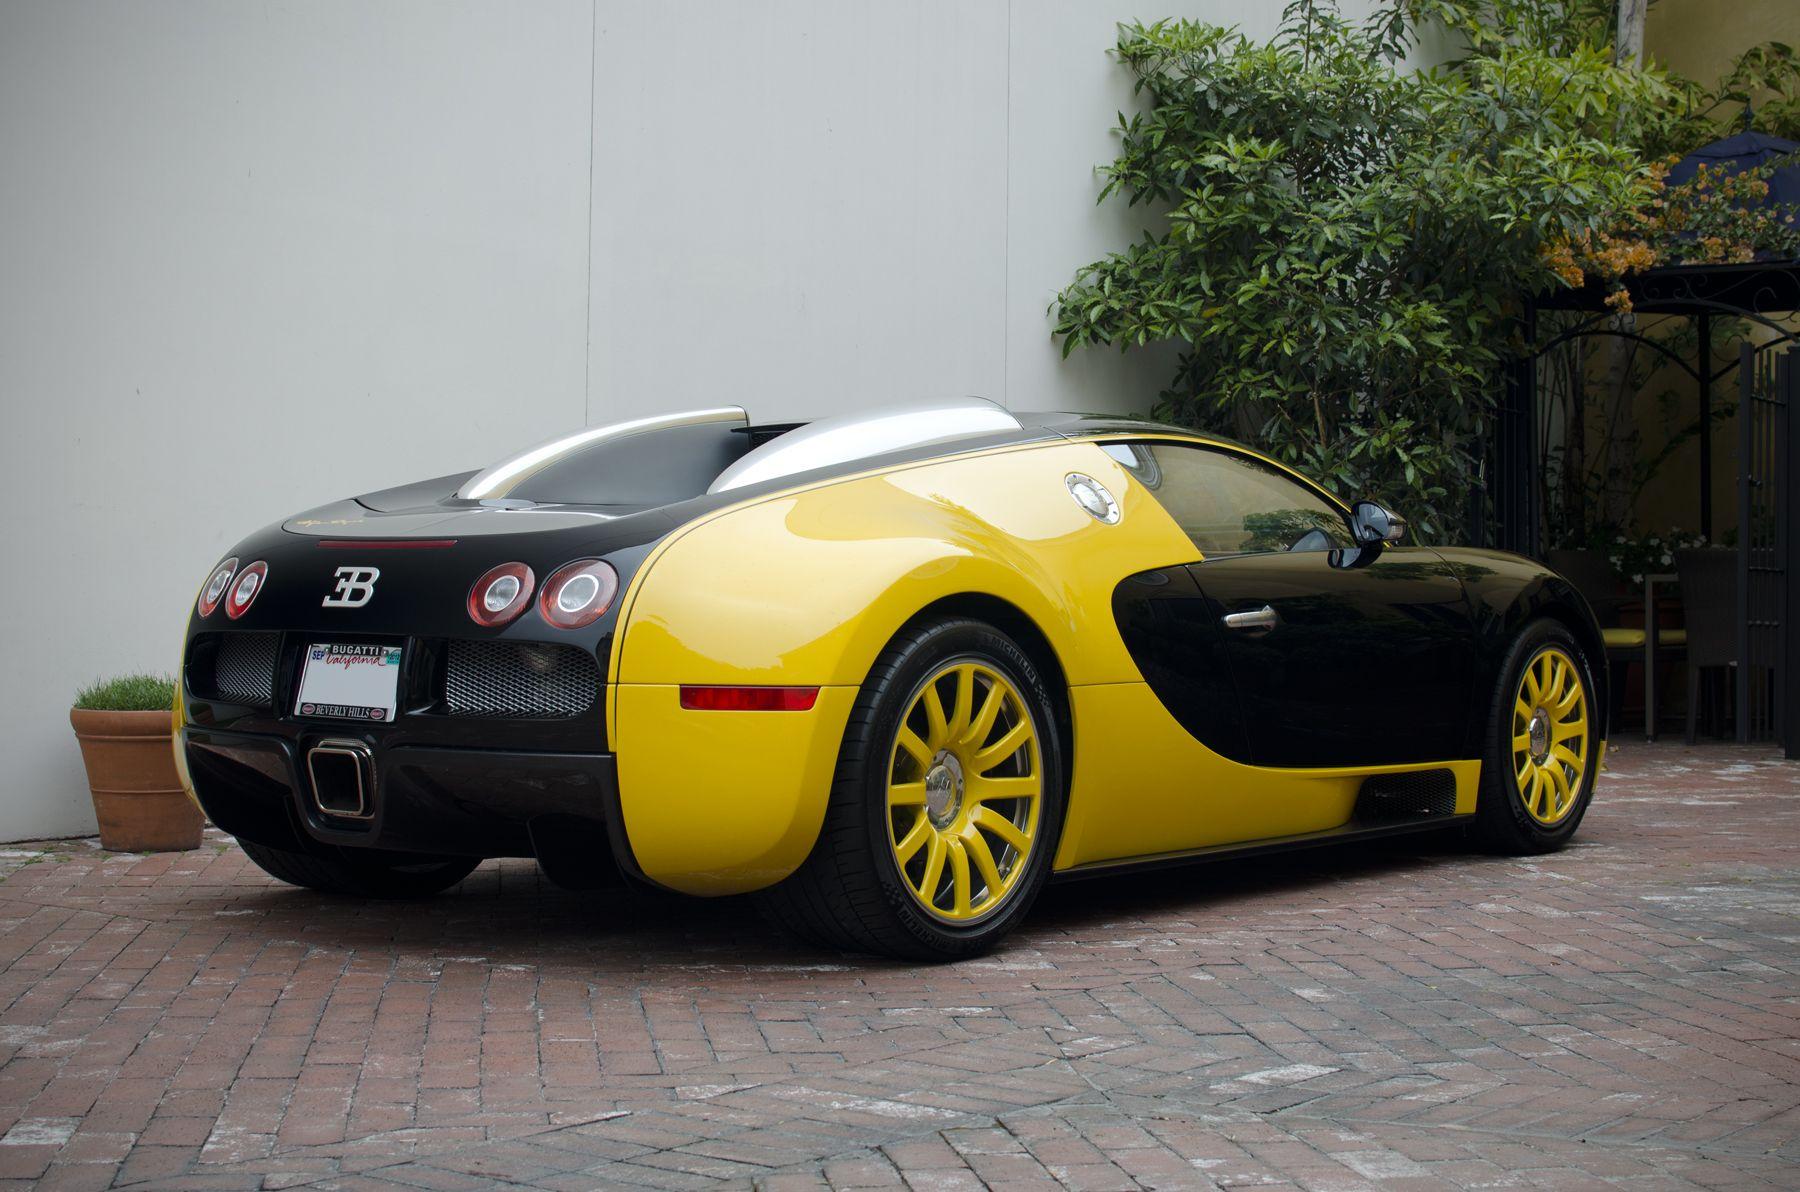 Bugatti Veyron Black And Yellow The famous bijan black/yellow ...